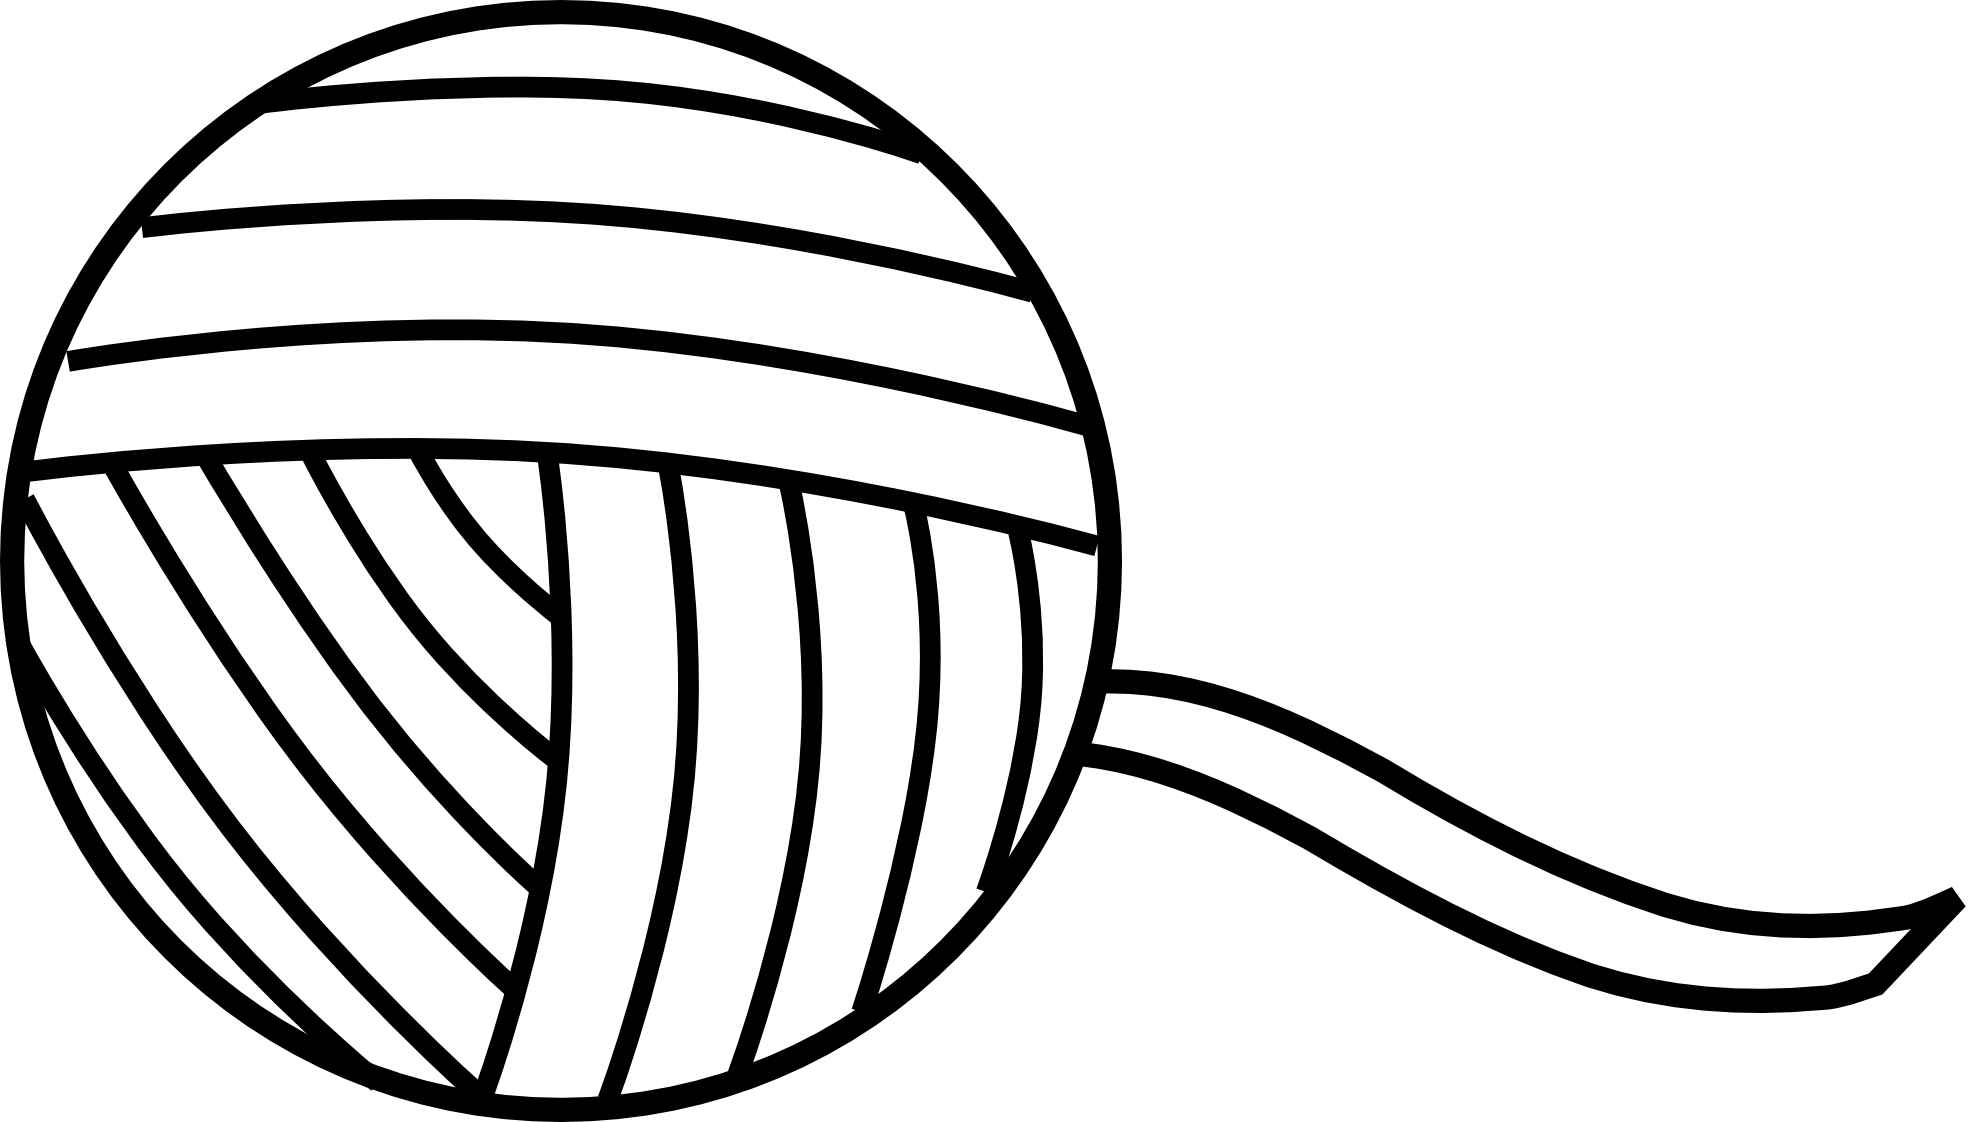 Ball Of Yarn Clipart #1 .-Ball Of Yarn Clipart #1 .-0